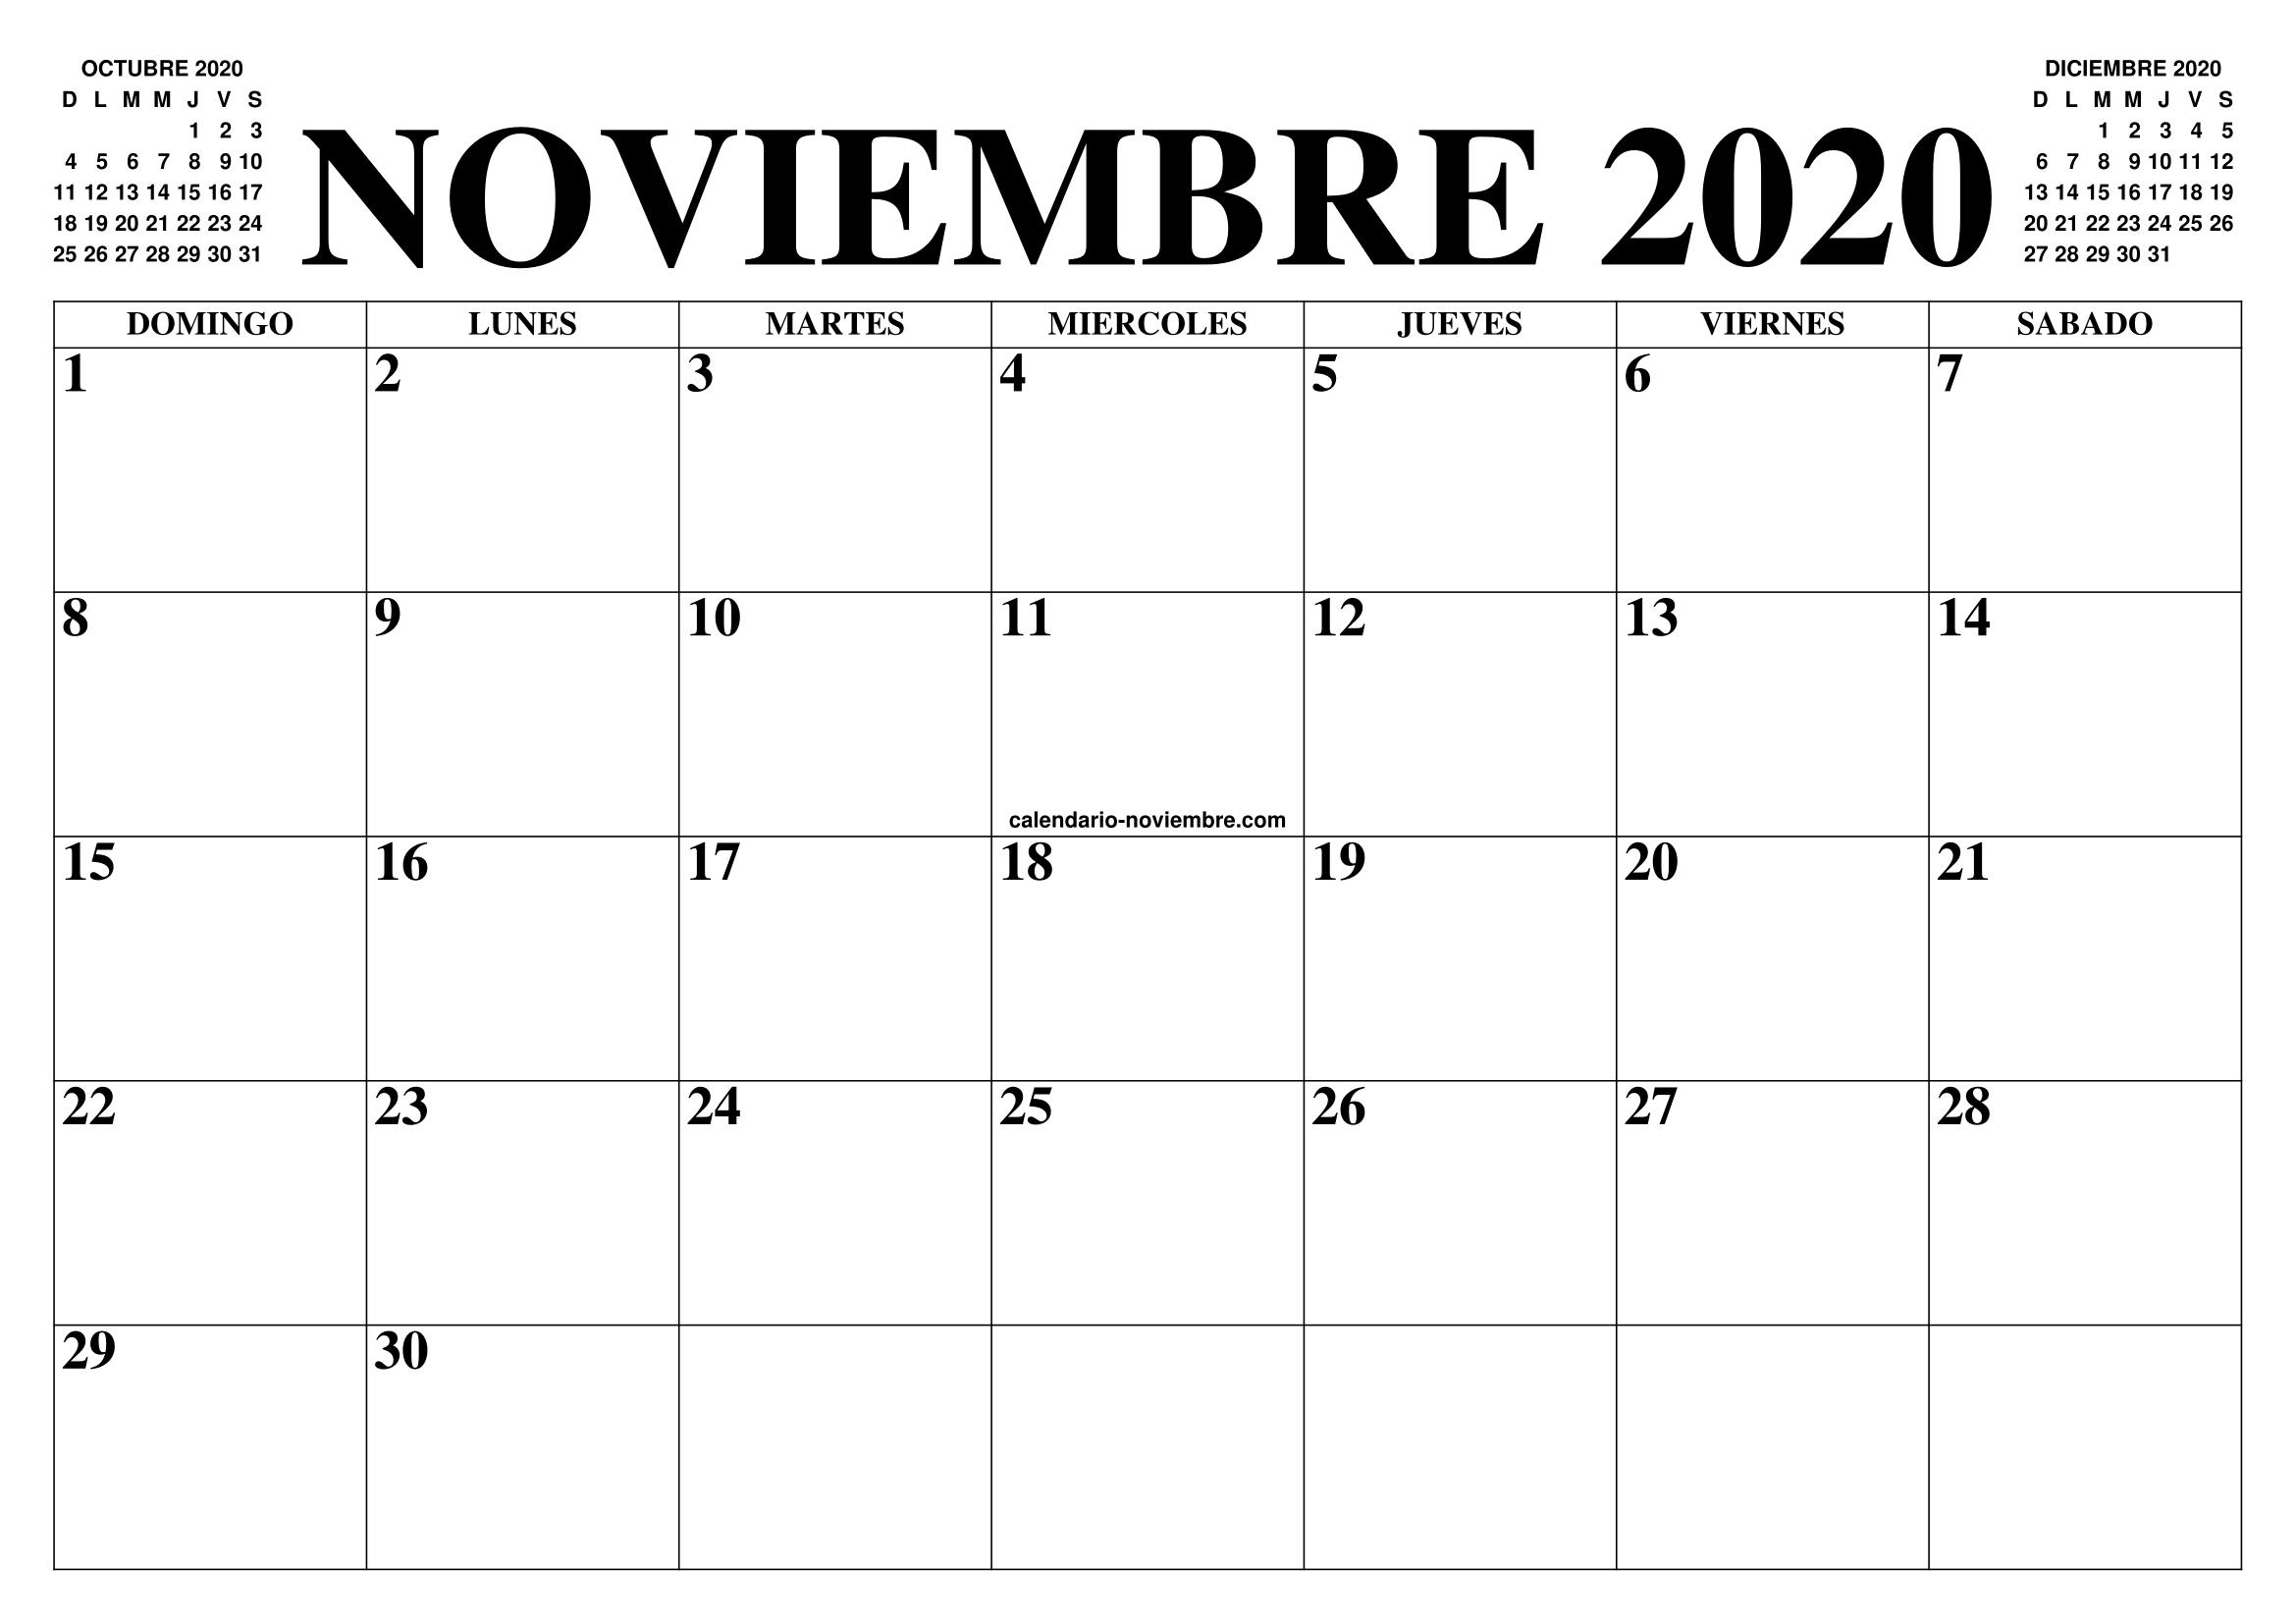 Calendario Mes De Octubre 2020 Para Imprimir.Calendario Mes De Octubre 2020